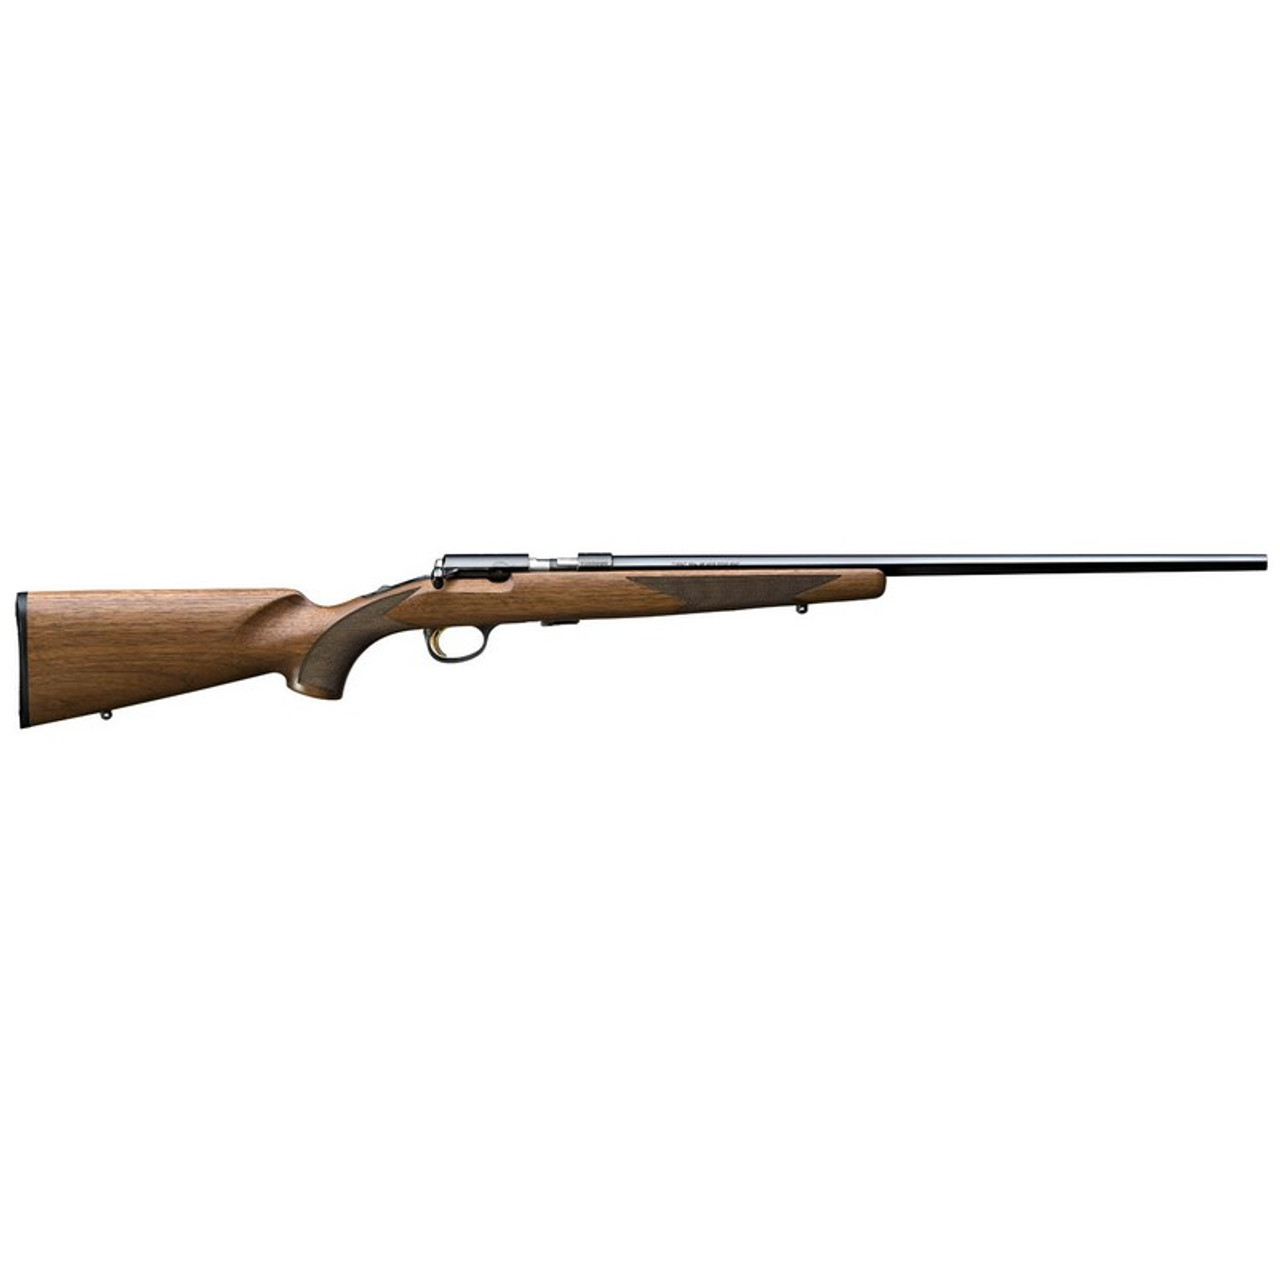 Browning T Bolt Sporter Threaded 22LR Rifle